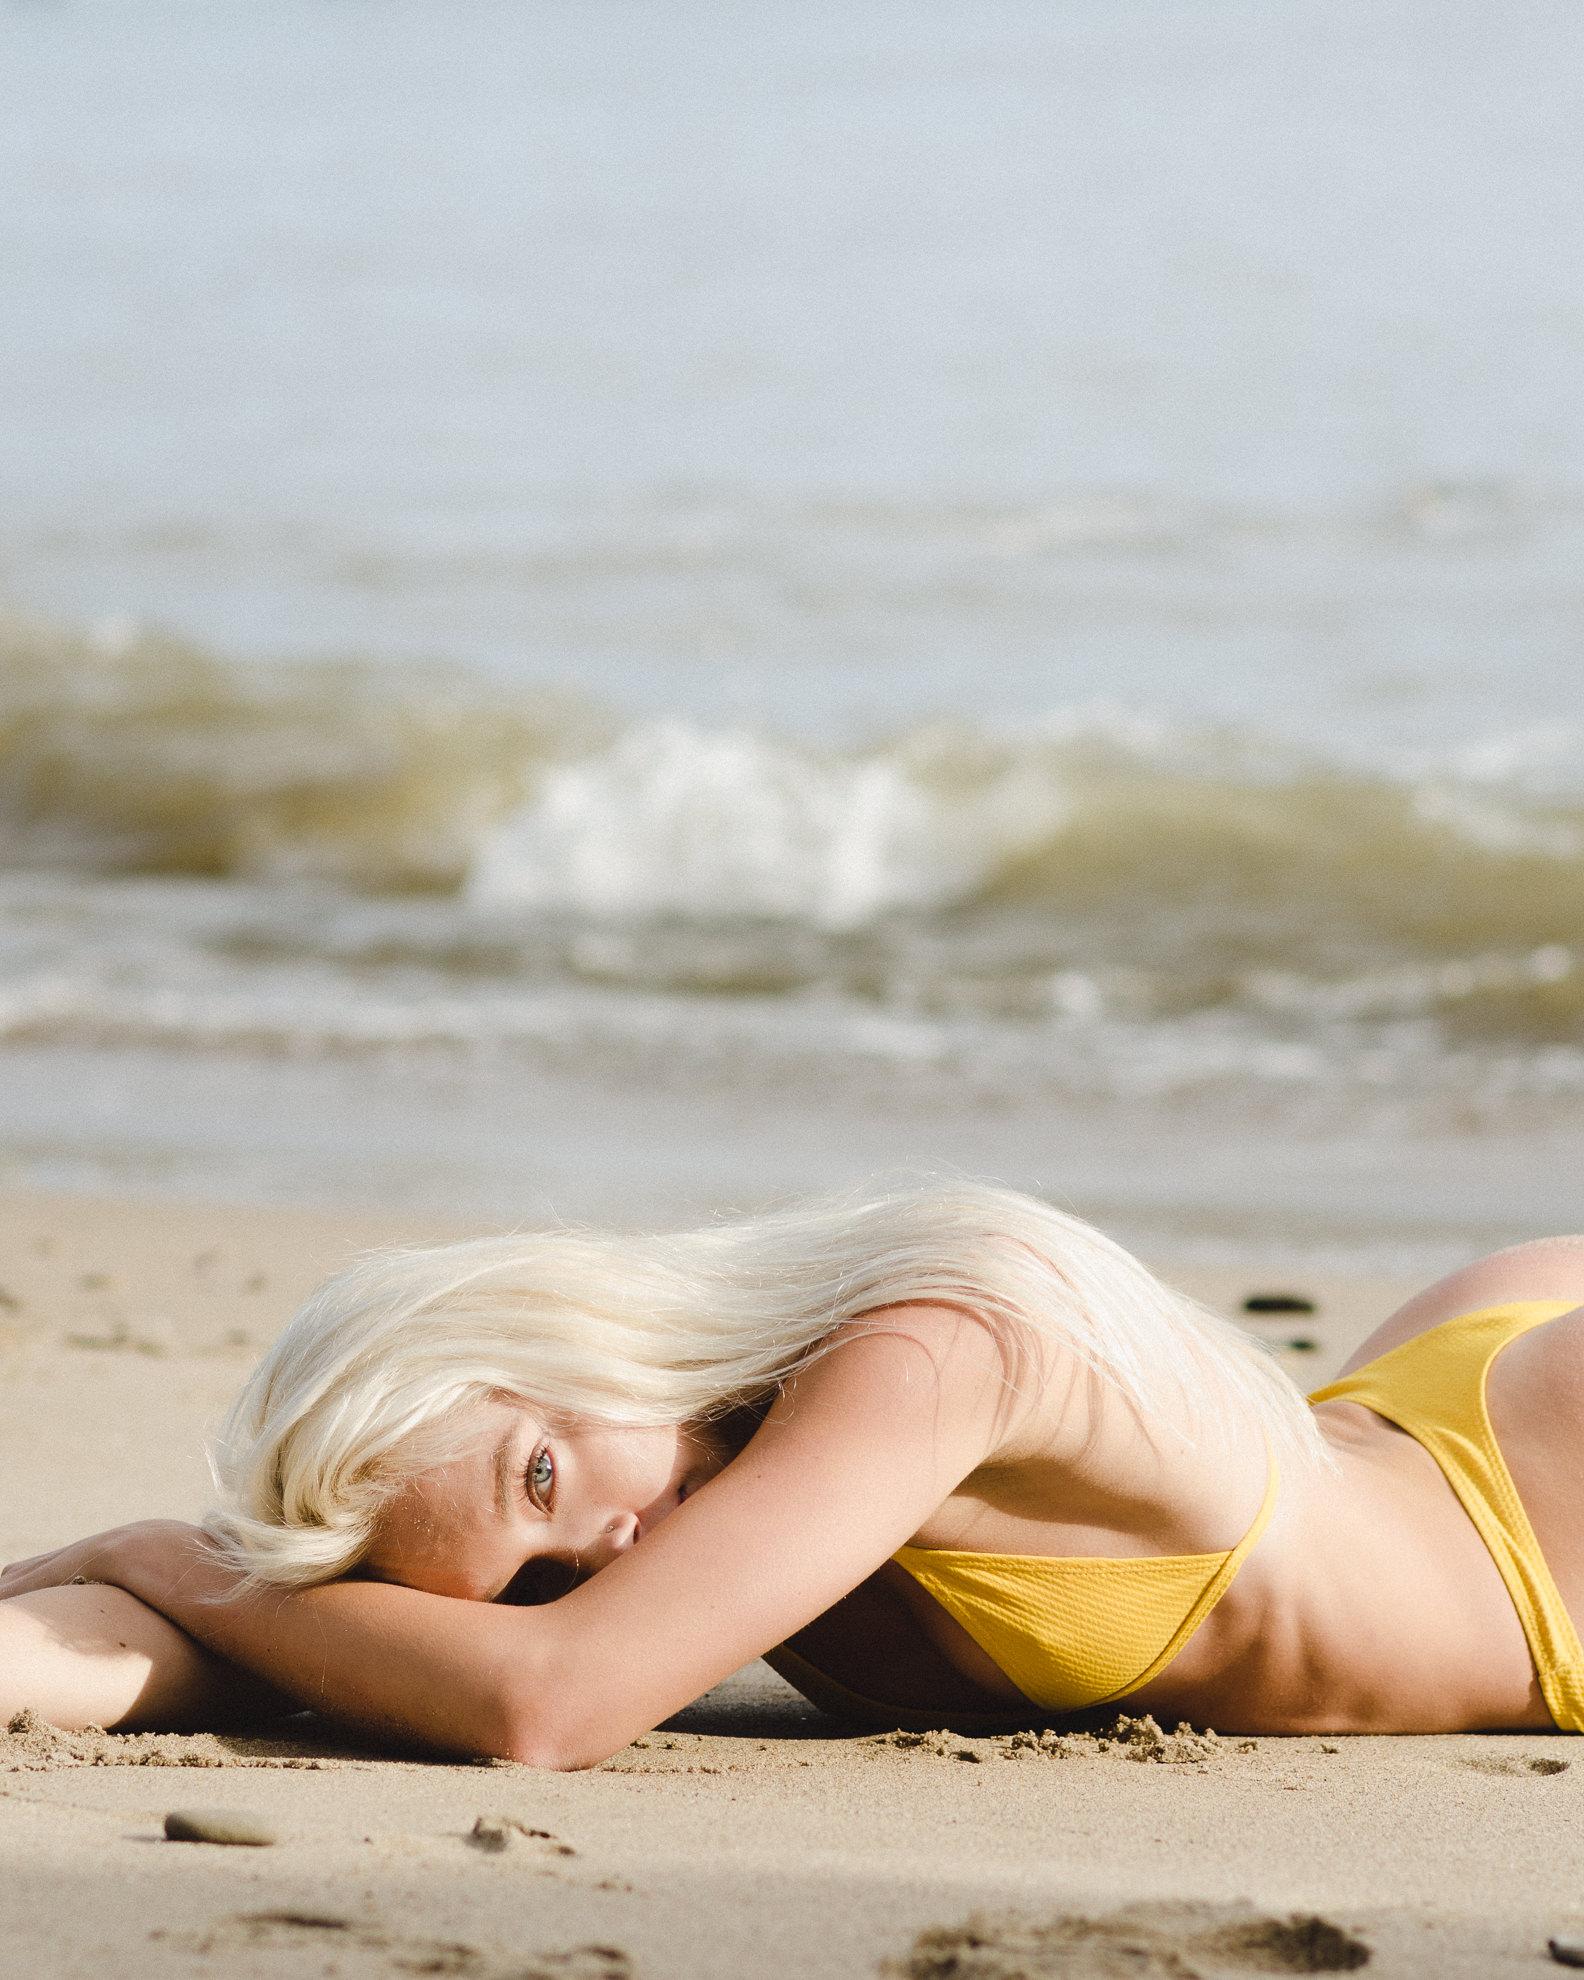 at the beach - carpinteria, california